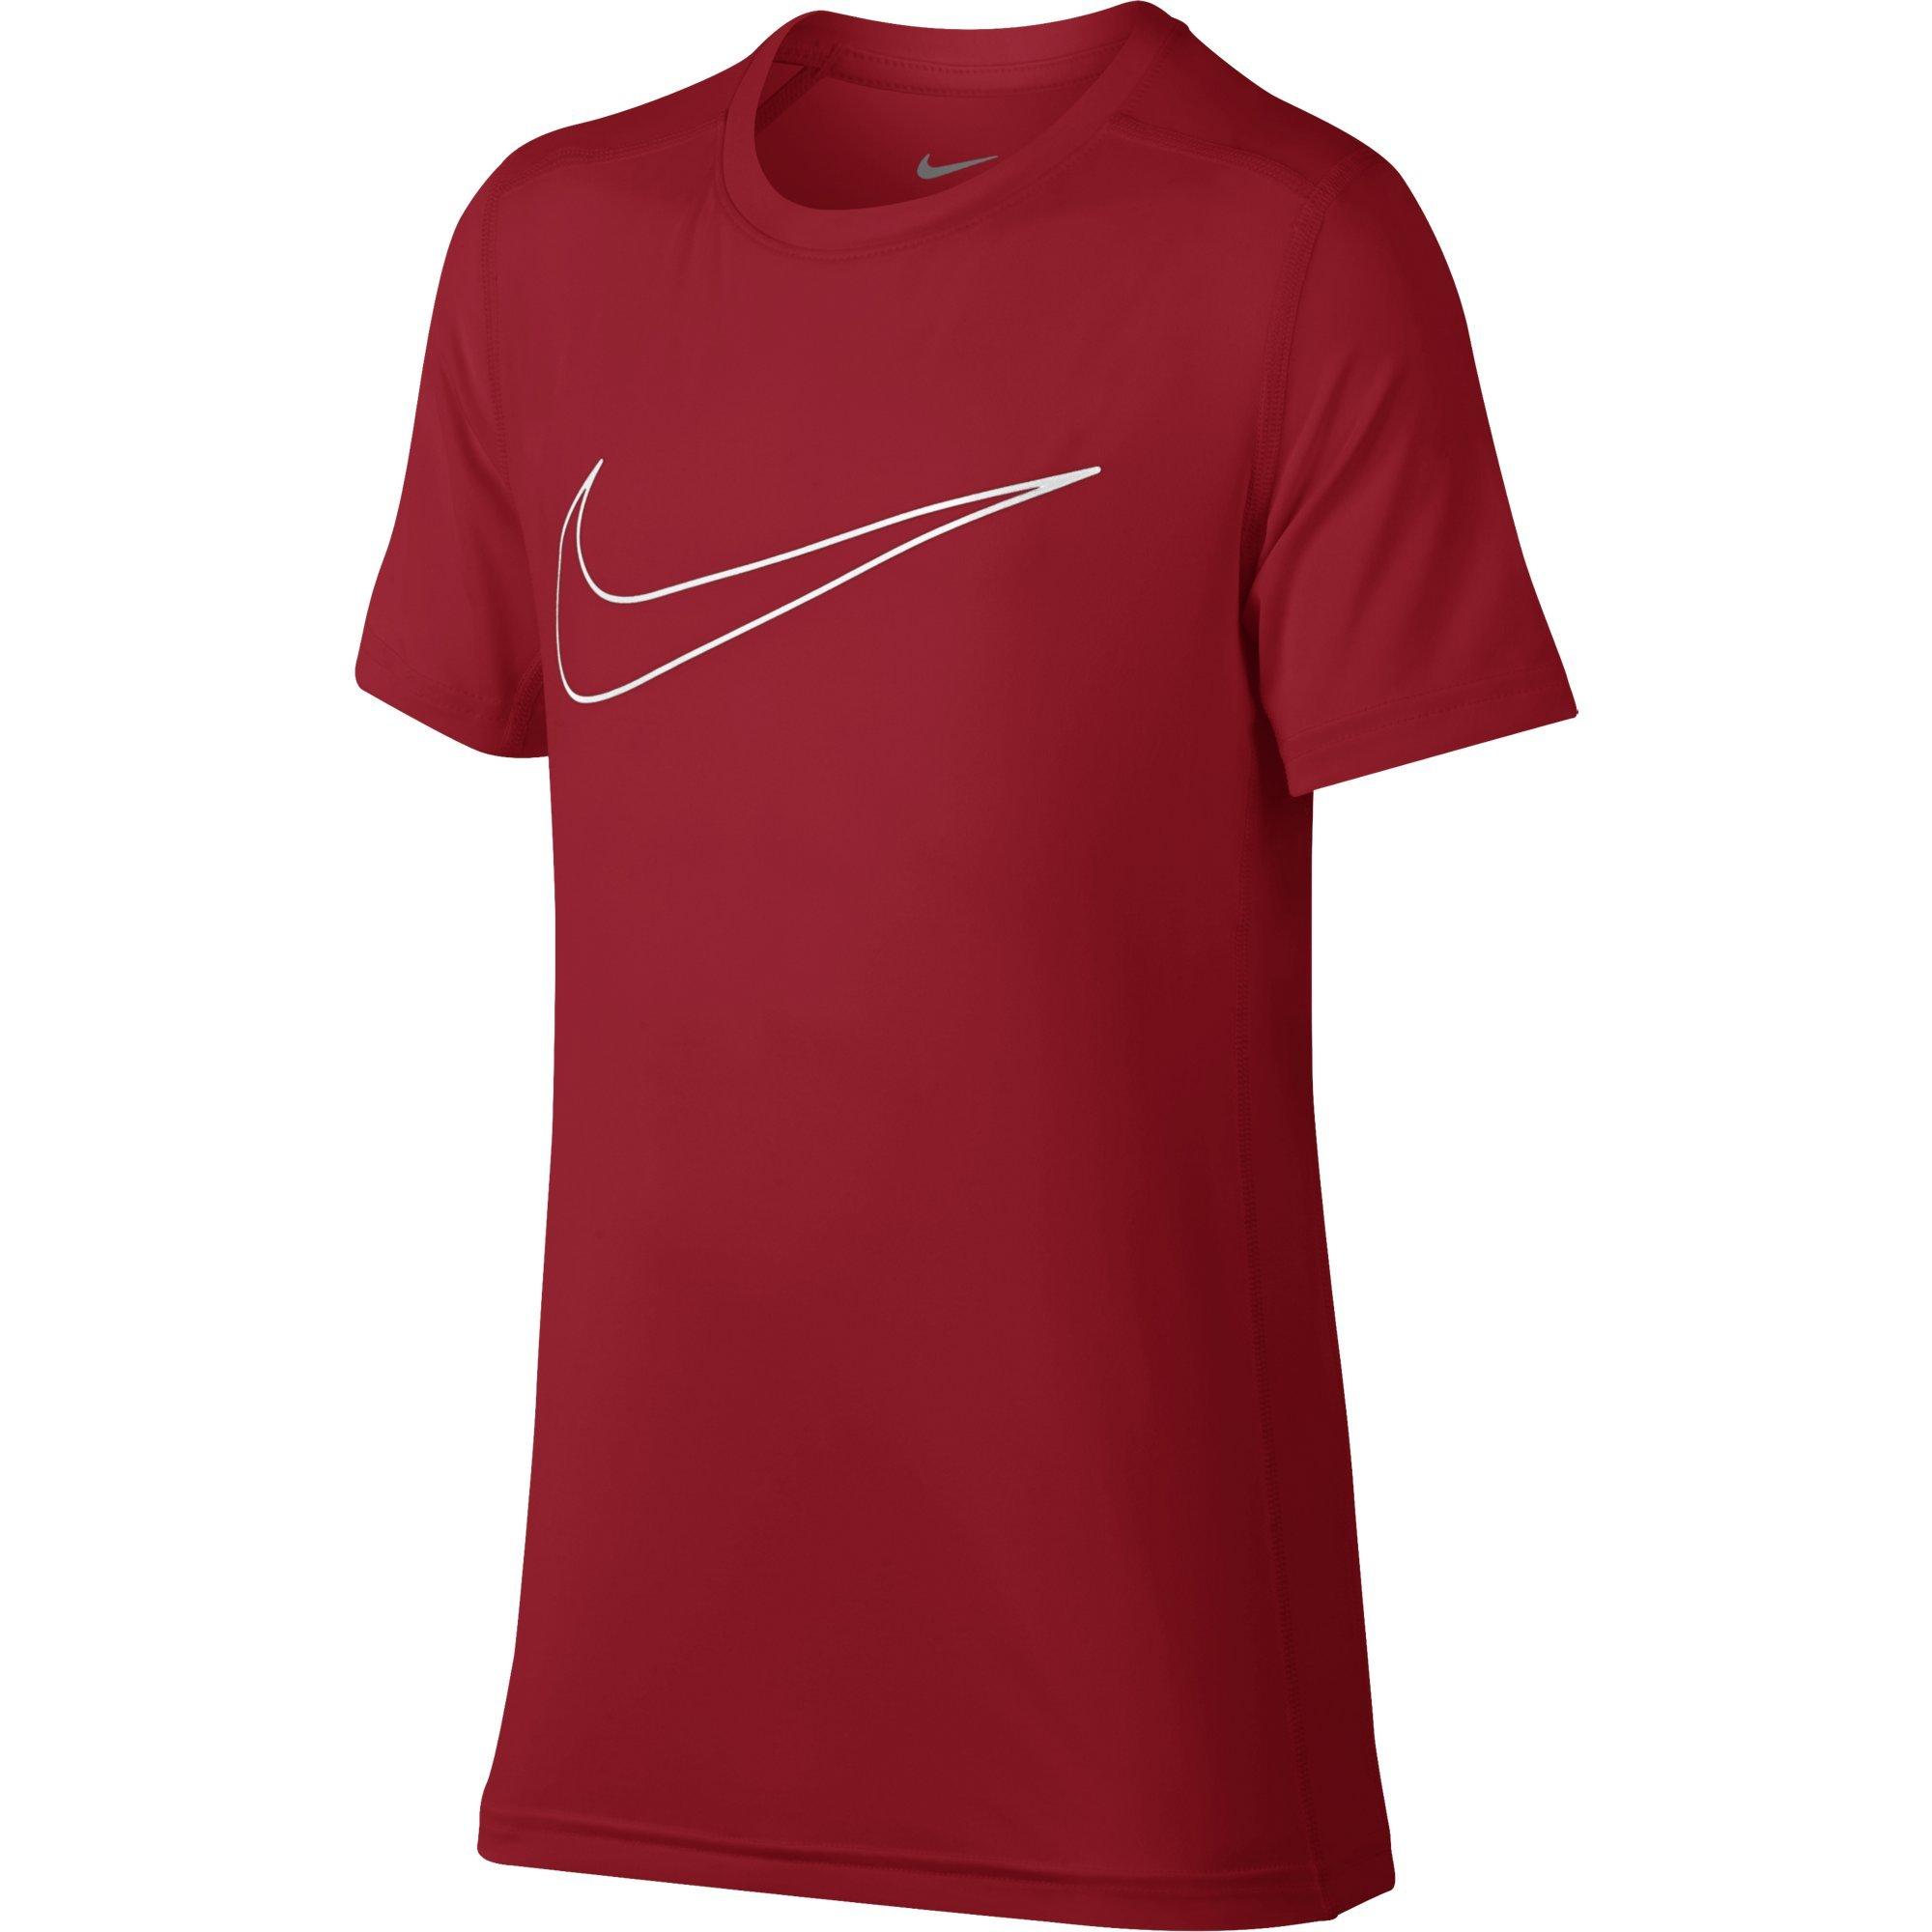 NIKE Boys' Short-Sleeve Training Shirt, University Red, Small